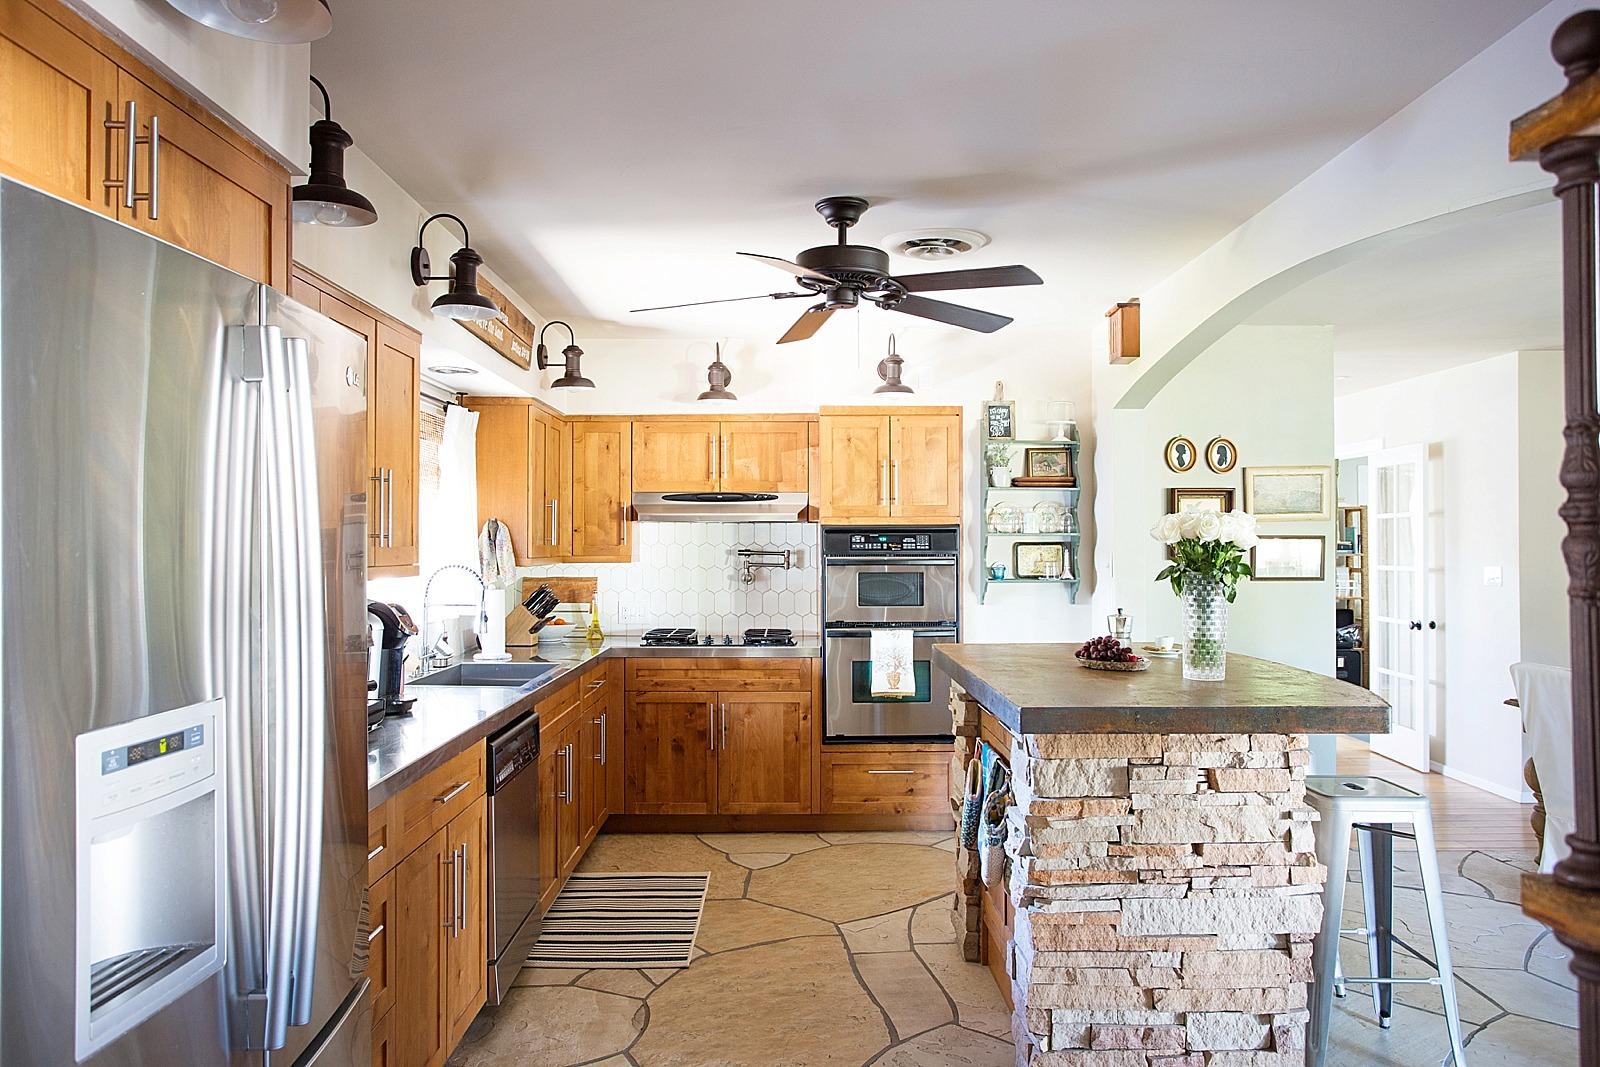 kitchen-diana-elizabeth-photography-blog-walker-zanger-cocoon-6th-avenue-mosaic-tile-white-tile-backsplash-9748